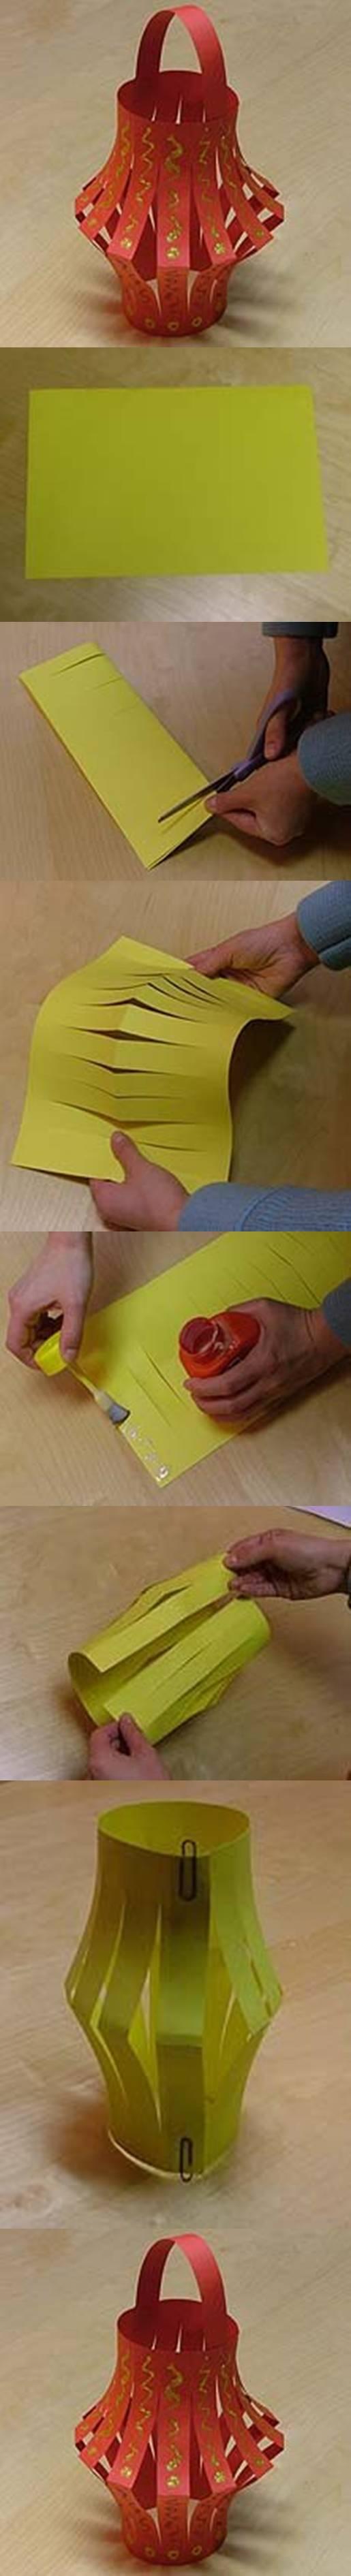 how-to-make-paper-lanterns3